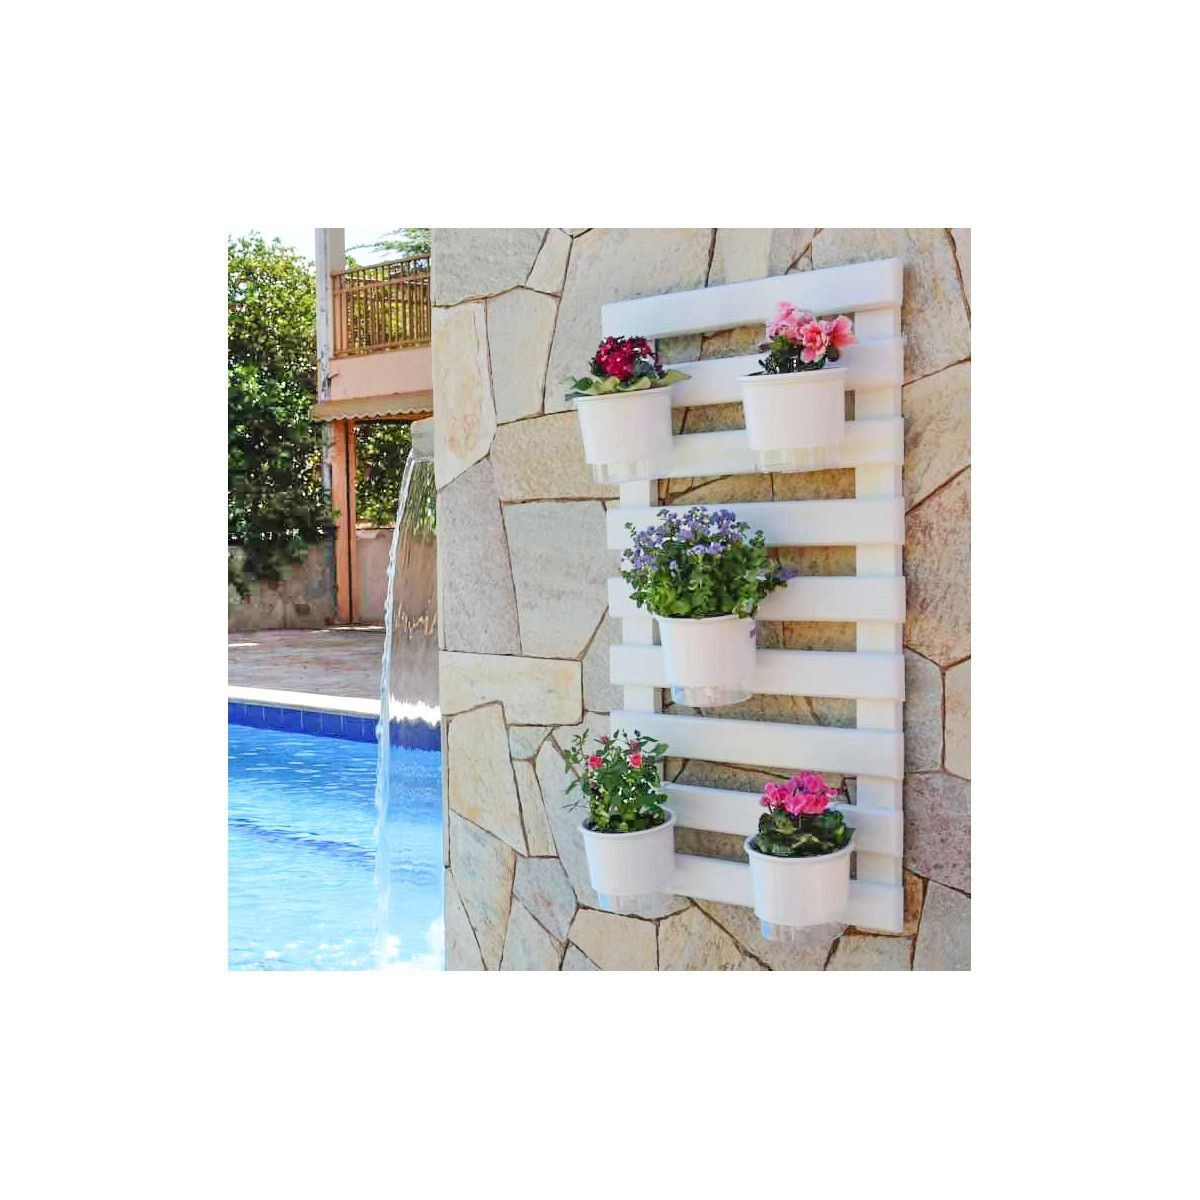 Kit Horta Vertical 100cm x 60cm cor Branca acompanha treliça + vasos + suportes + substrato